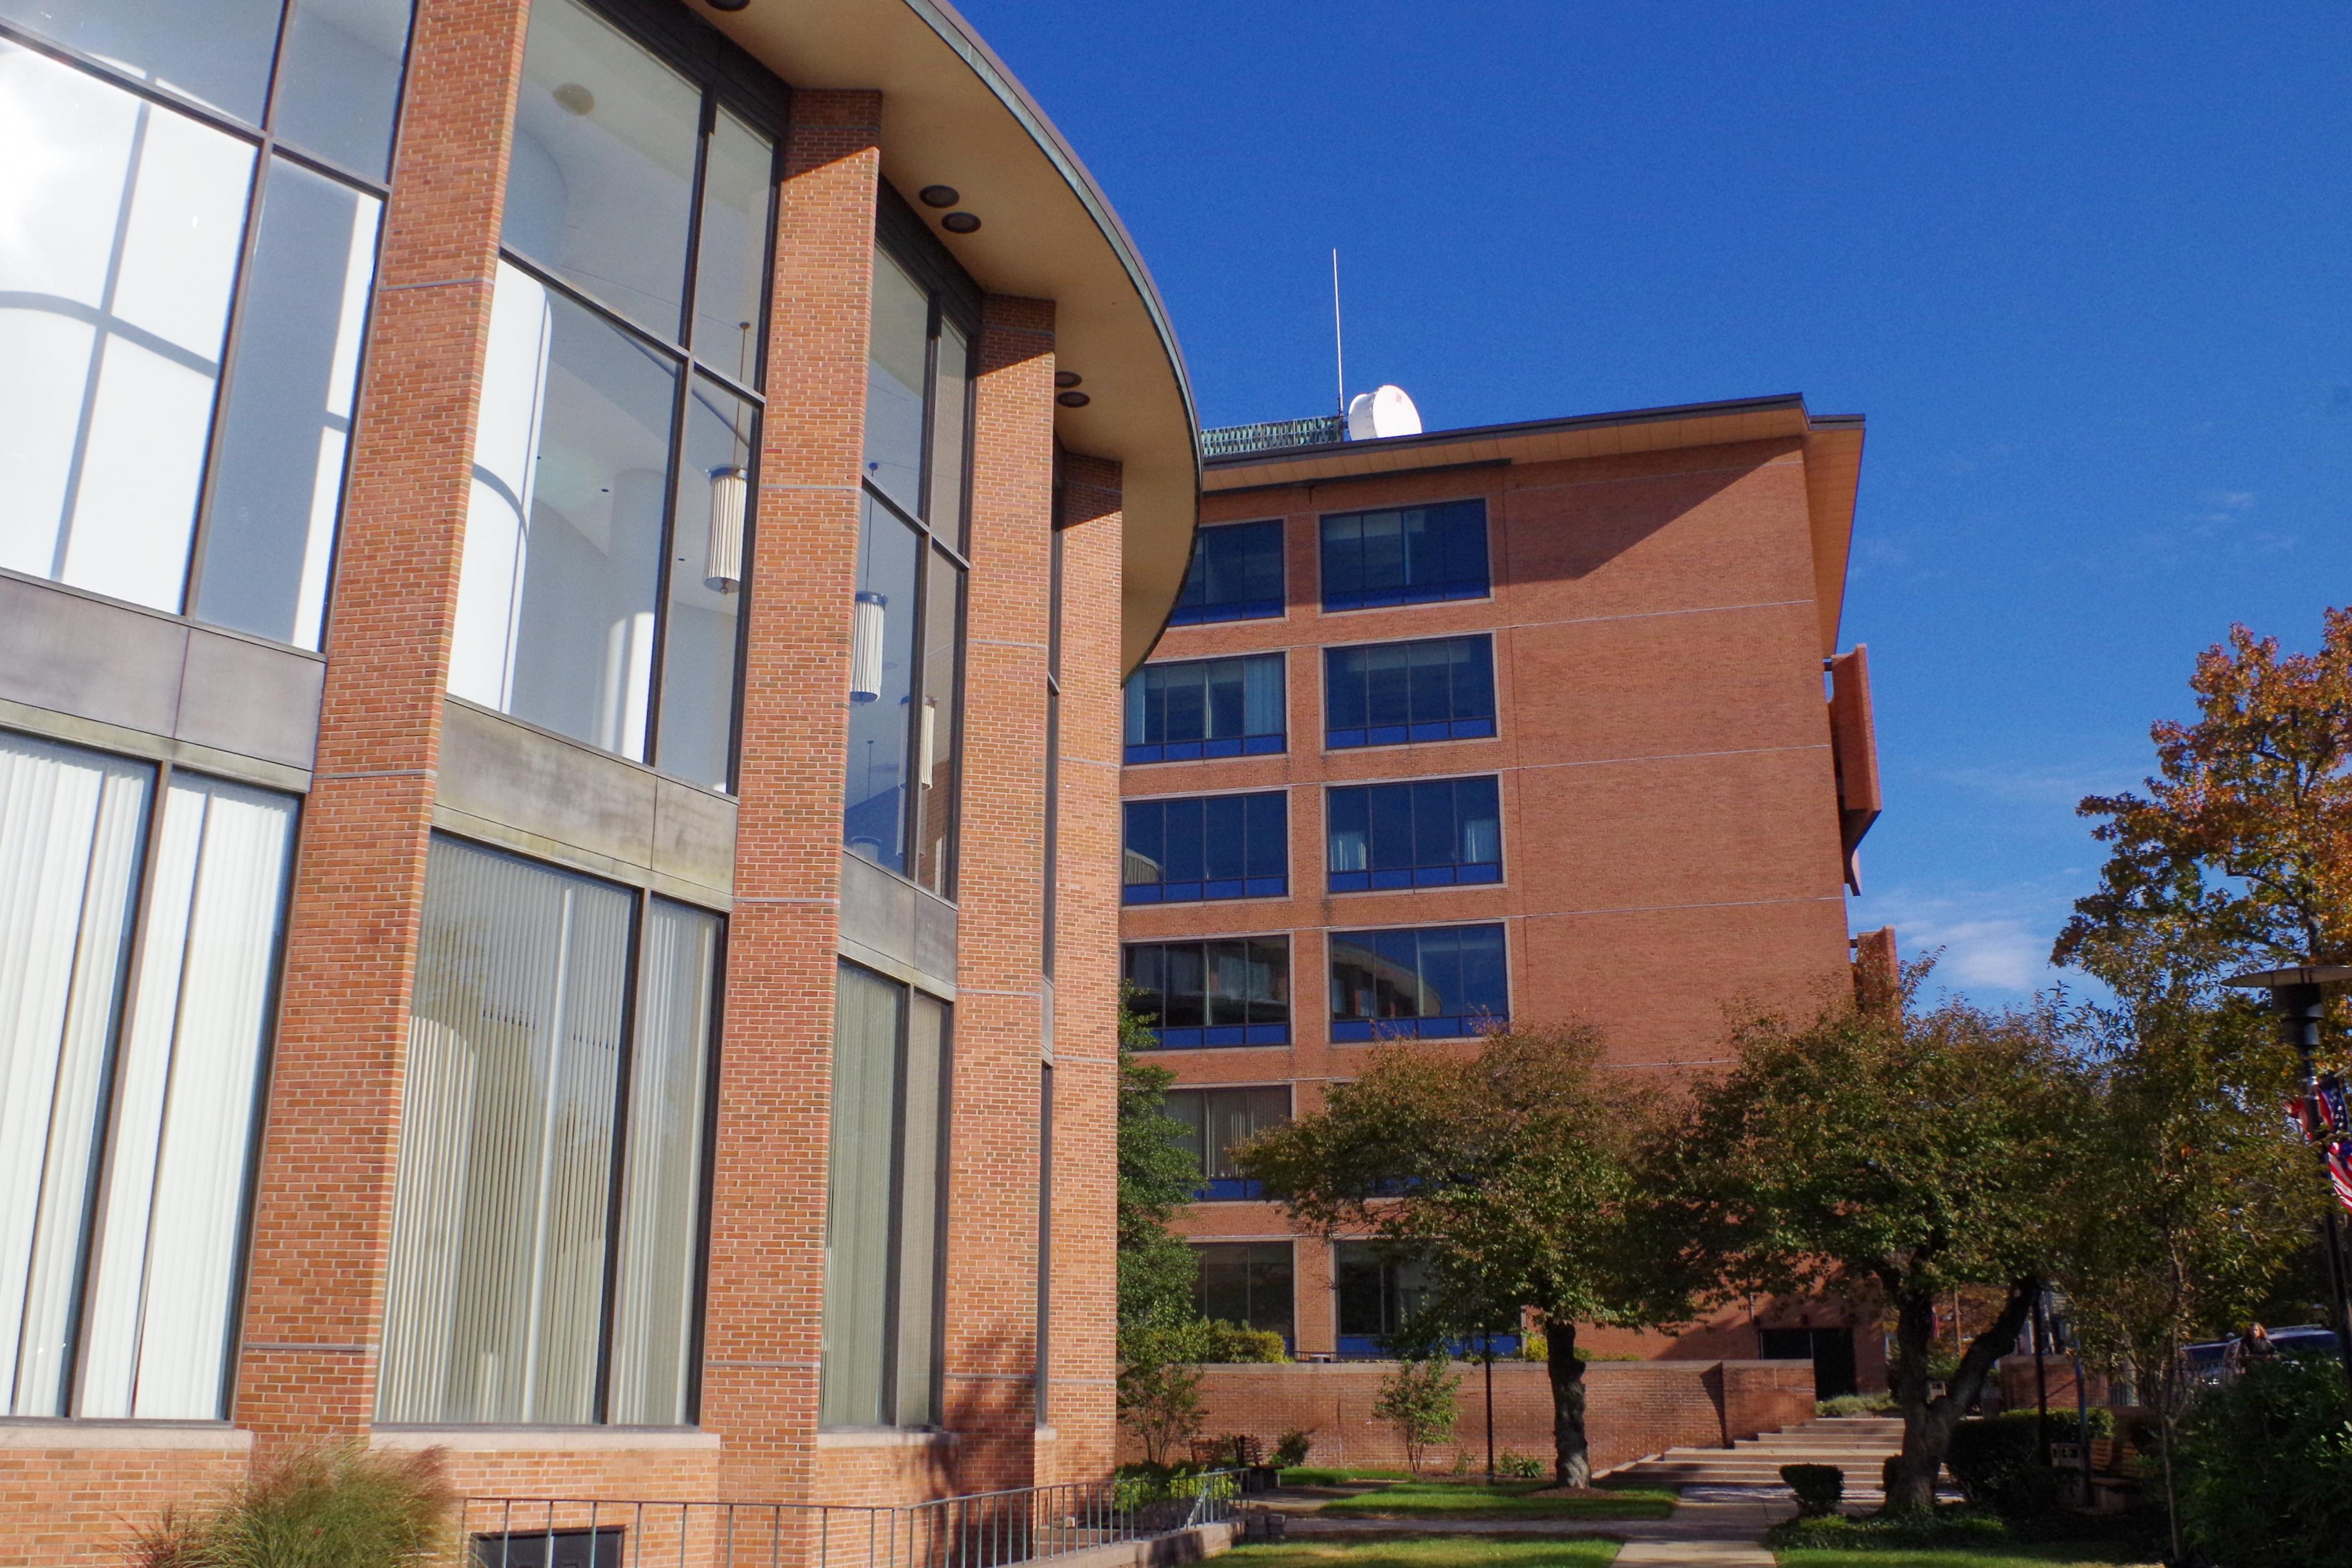 Bucks County Us Courthouses